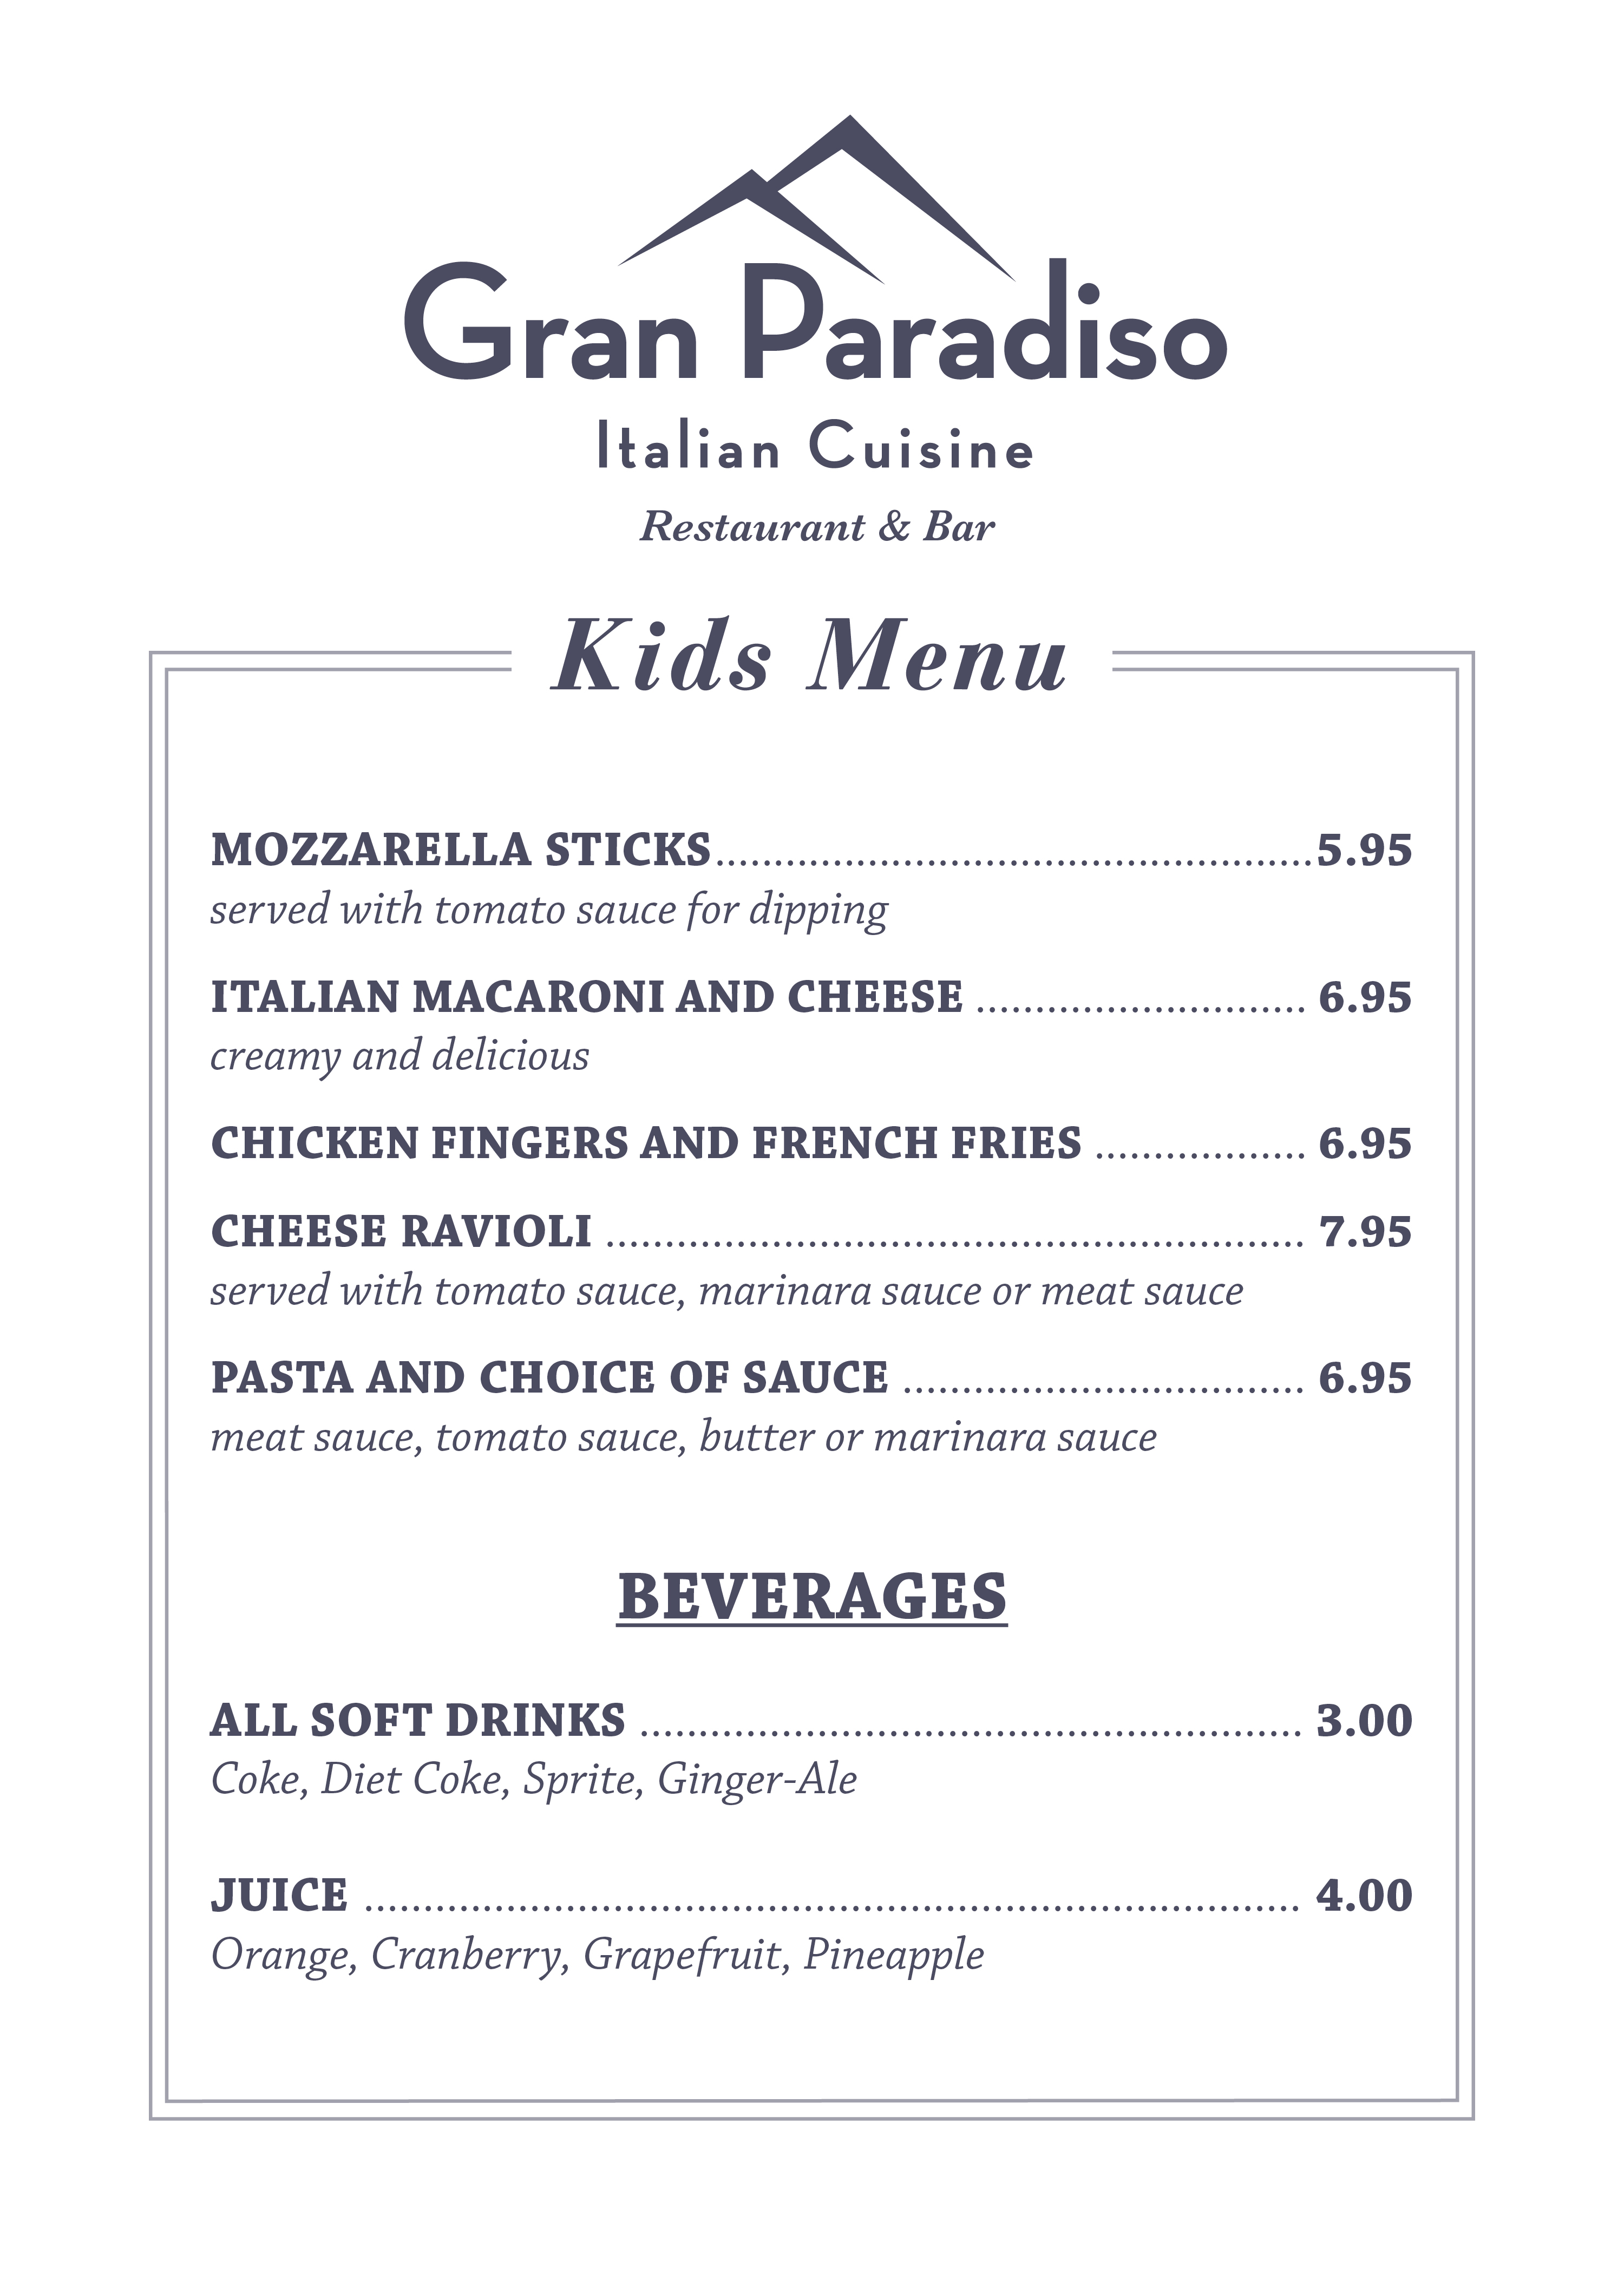 Gran Paradiso-Kids Menu-5x7